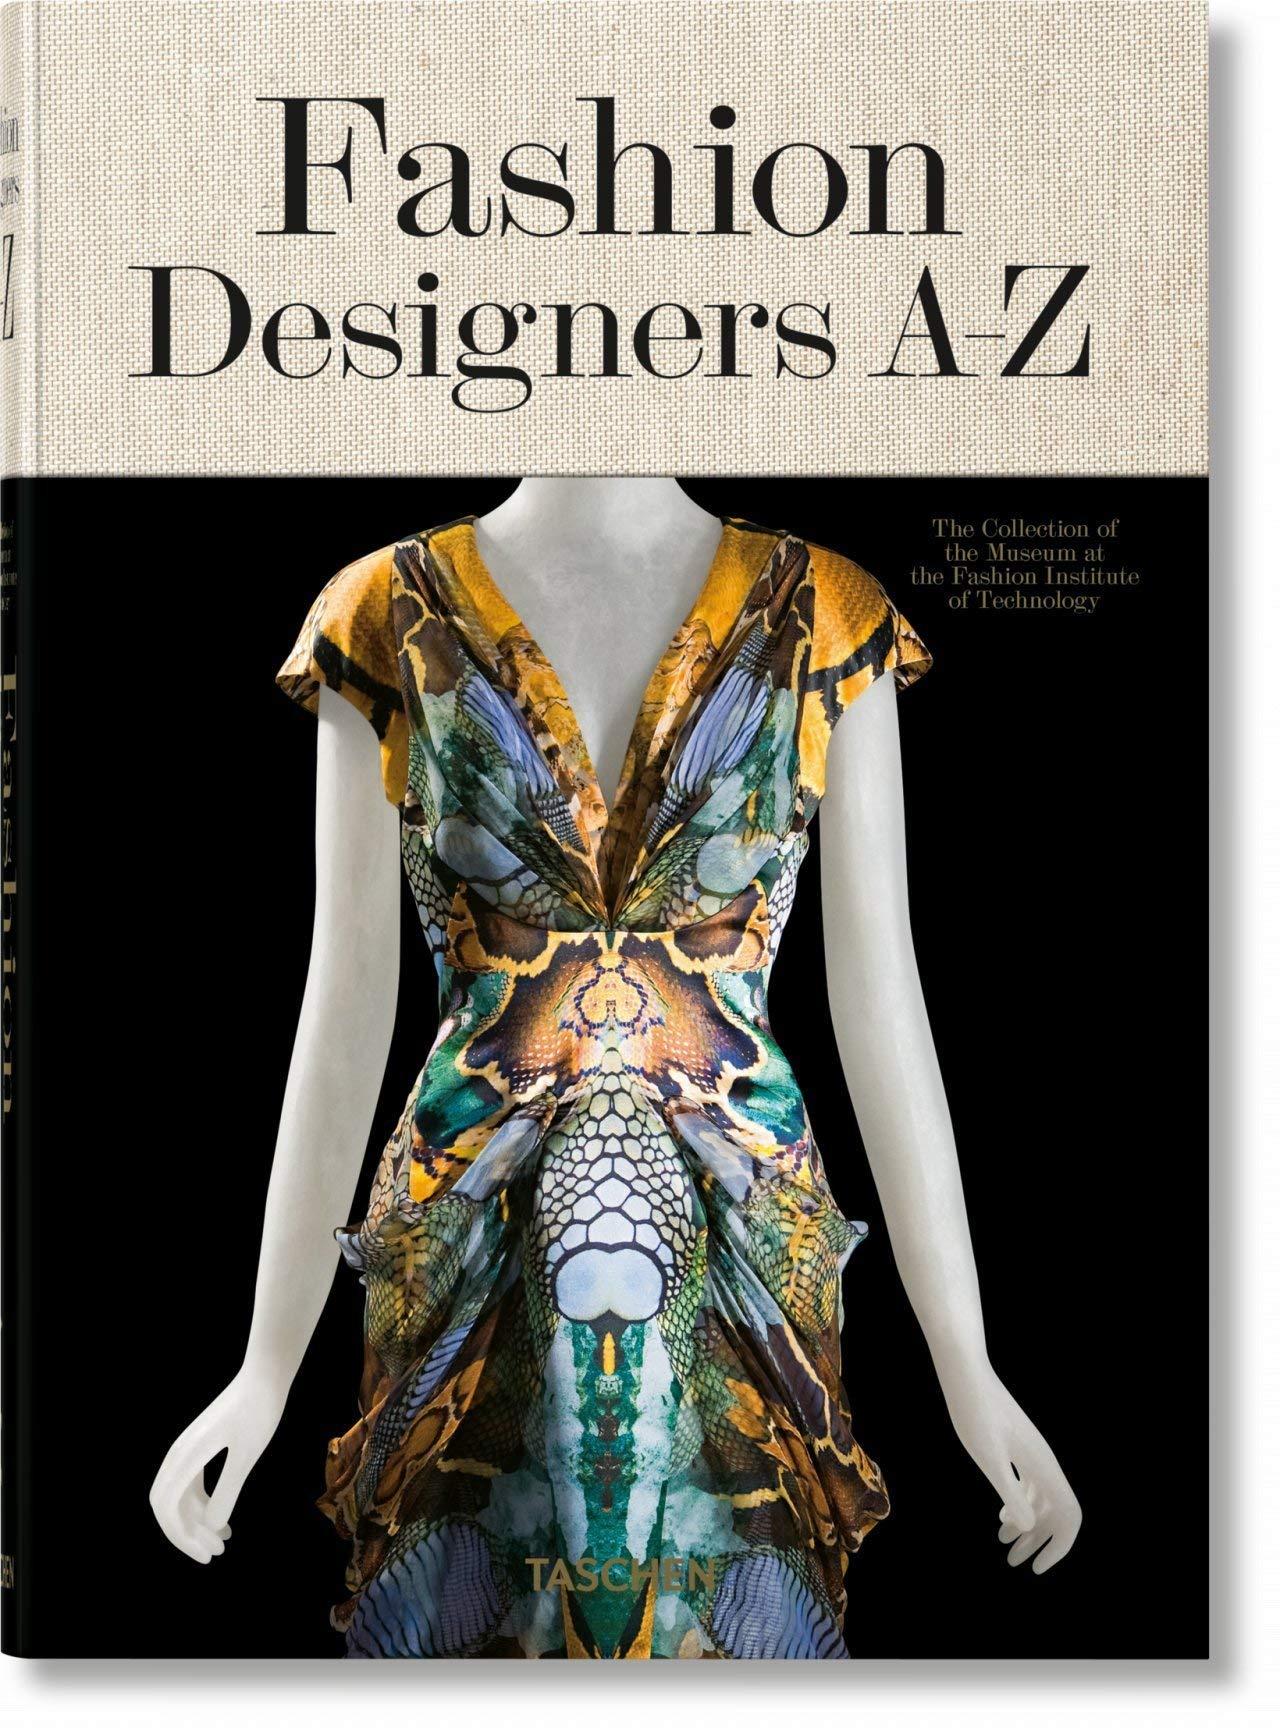 Fashion Designers A Z Steele Valerie Menkes Suzy Nippoldt Robert 9783836565578 Amazon Com Books